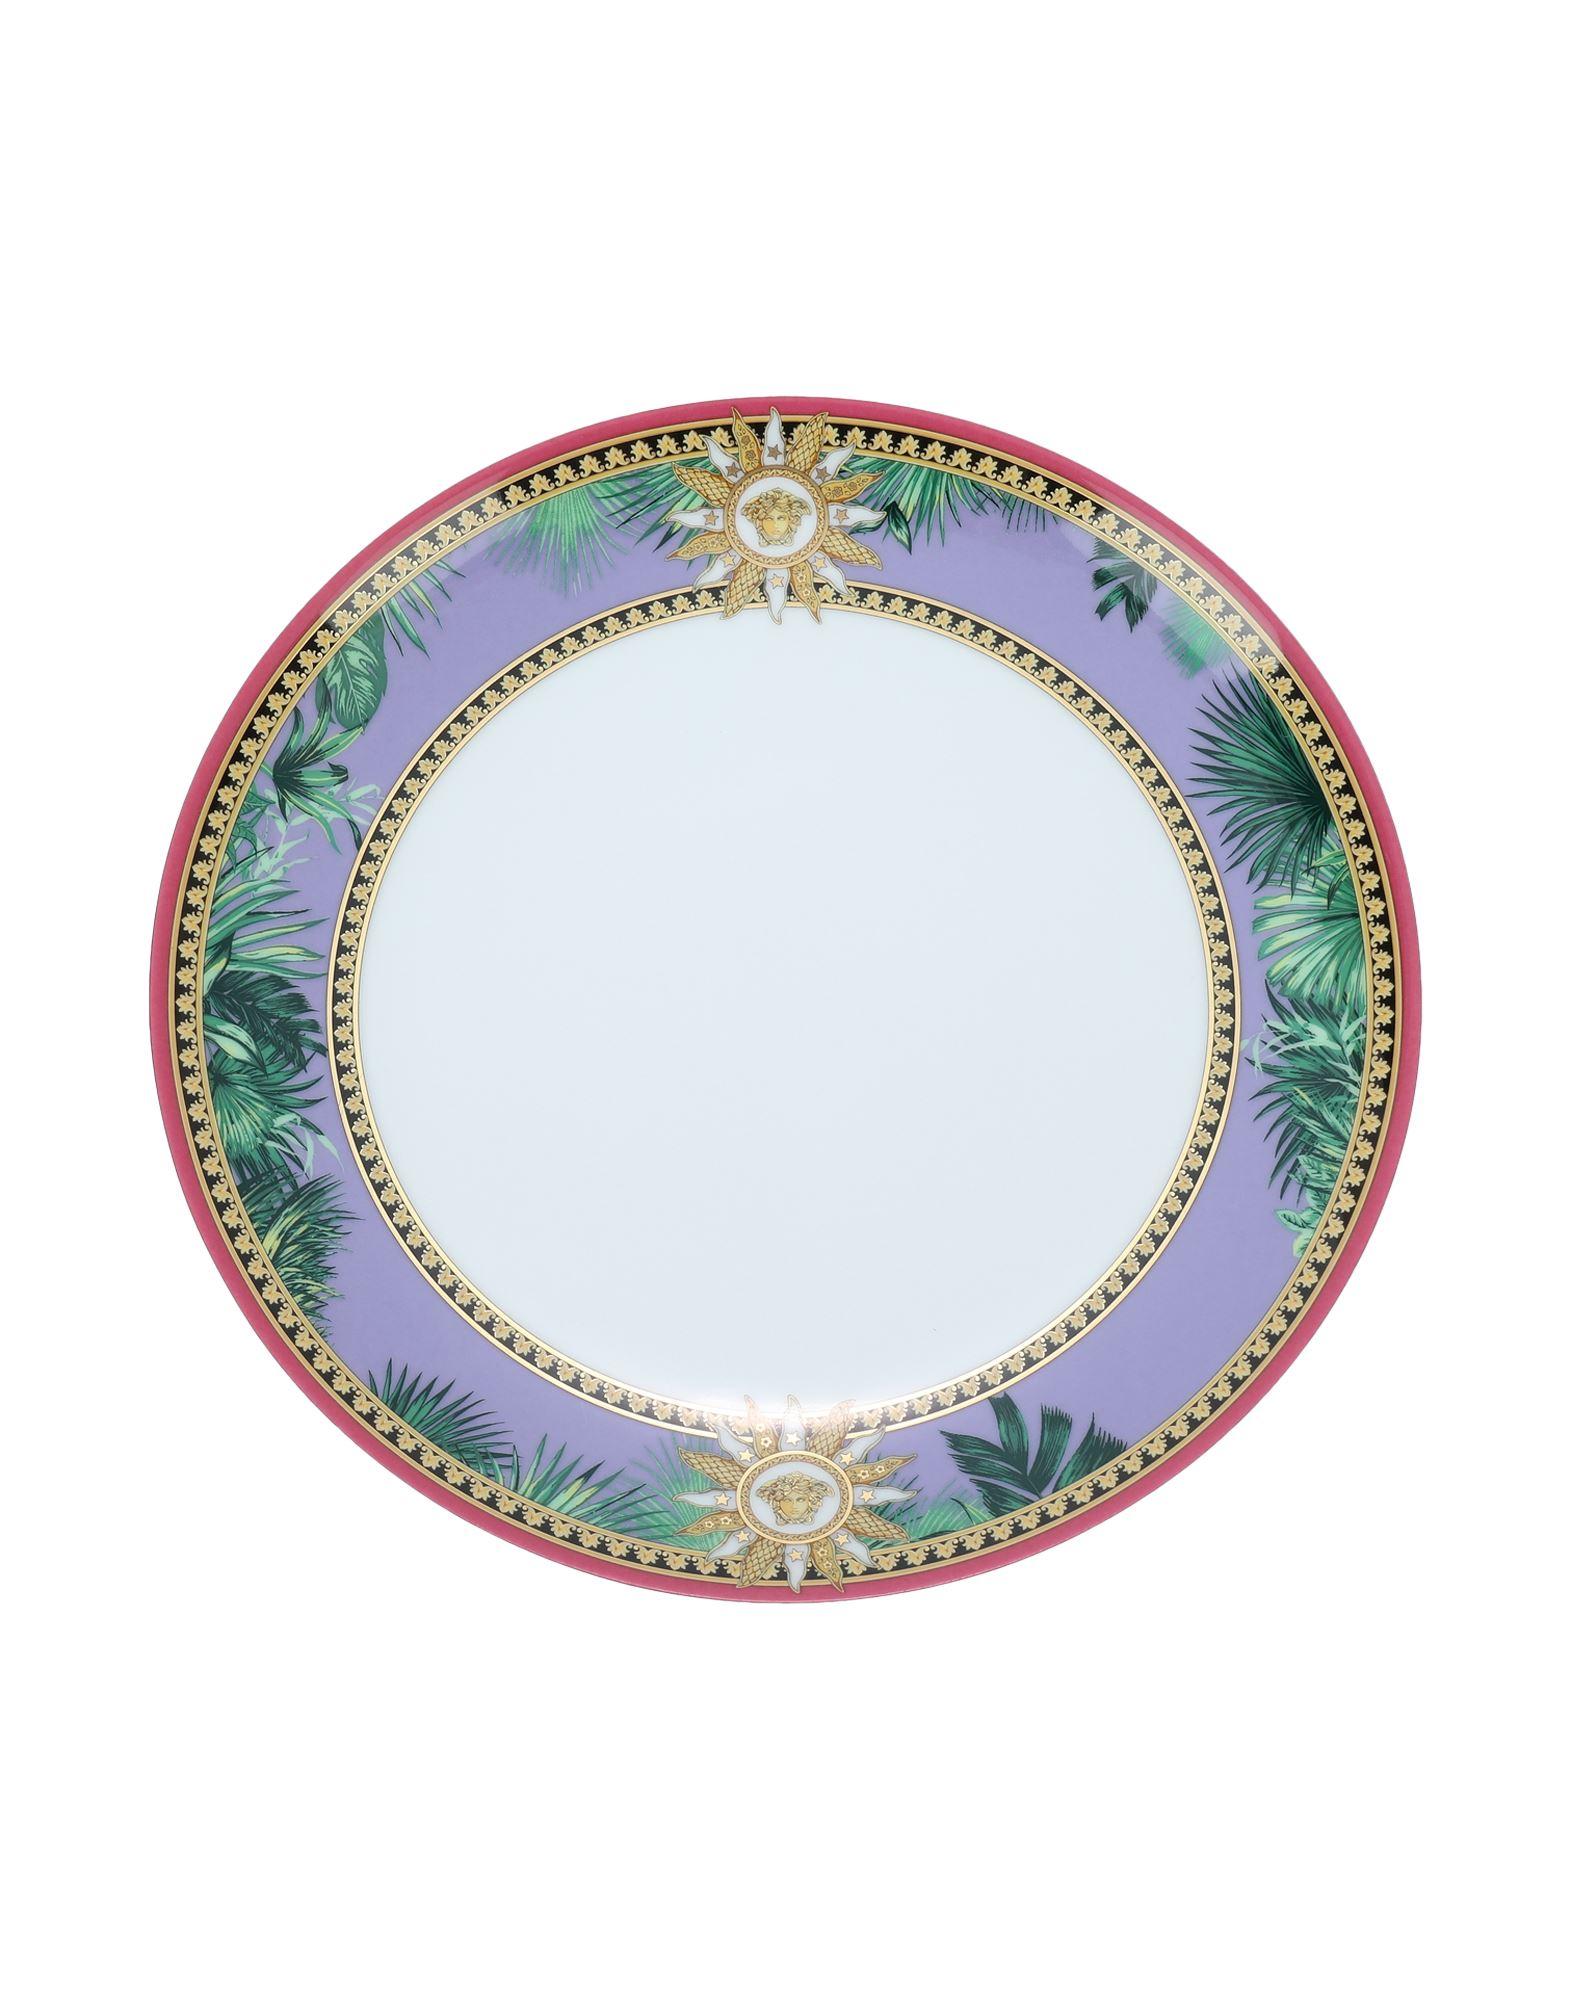 rosenthal selection brillance fleurs sauvages тарелка coup 27 см VERSACE x ROSENTHAL Декоративная тарелка